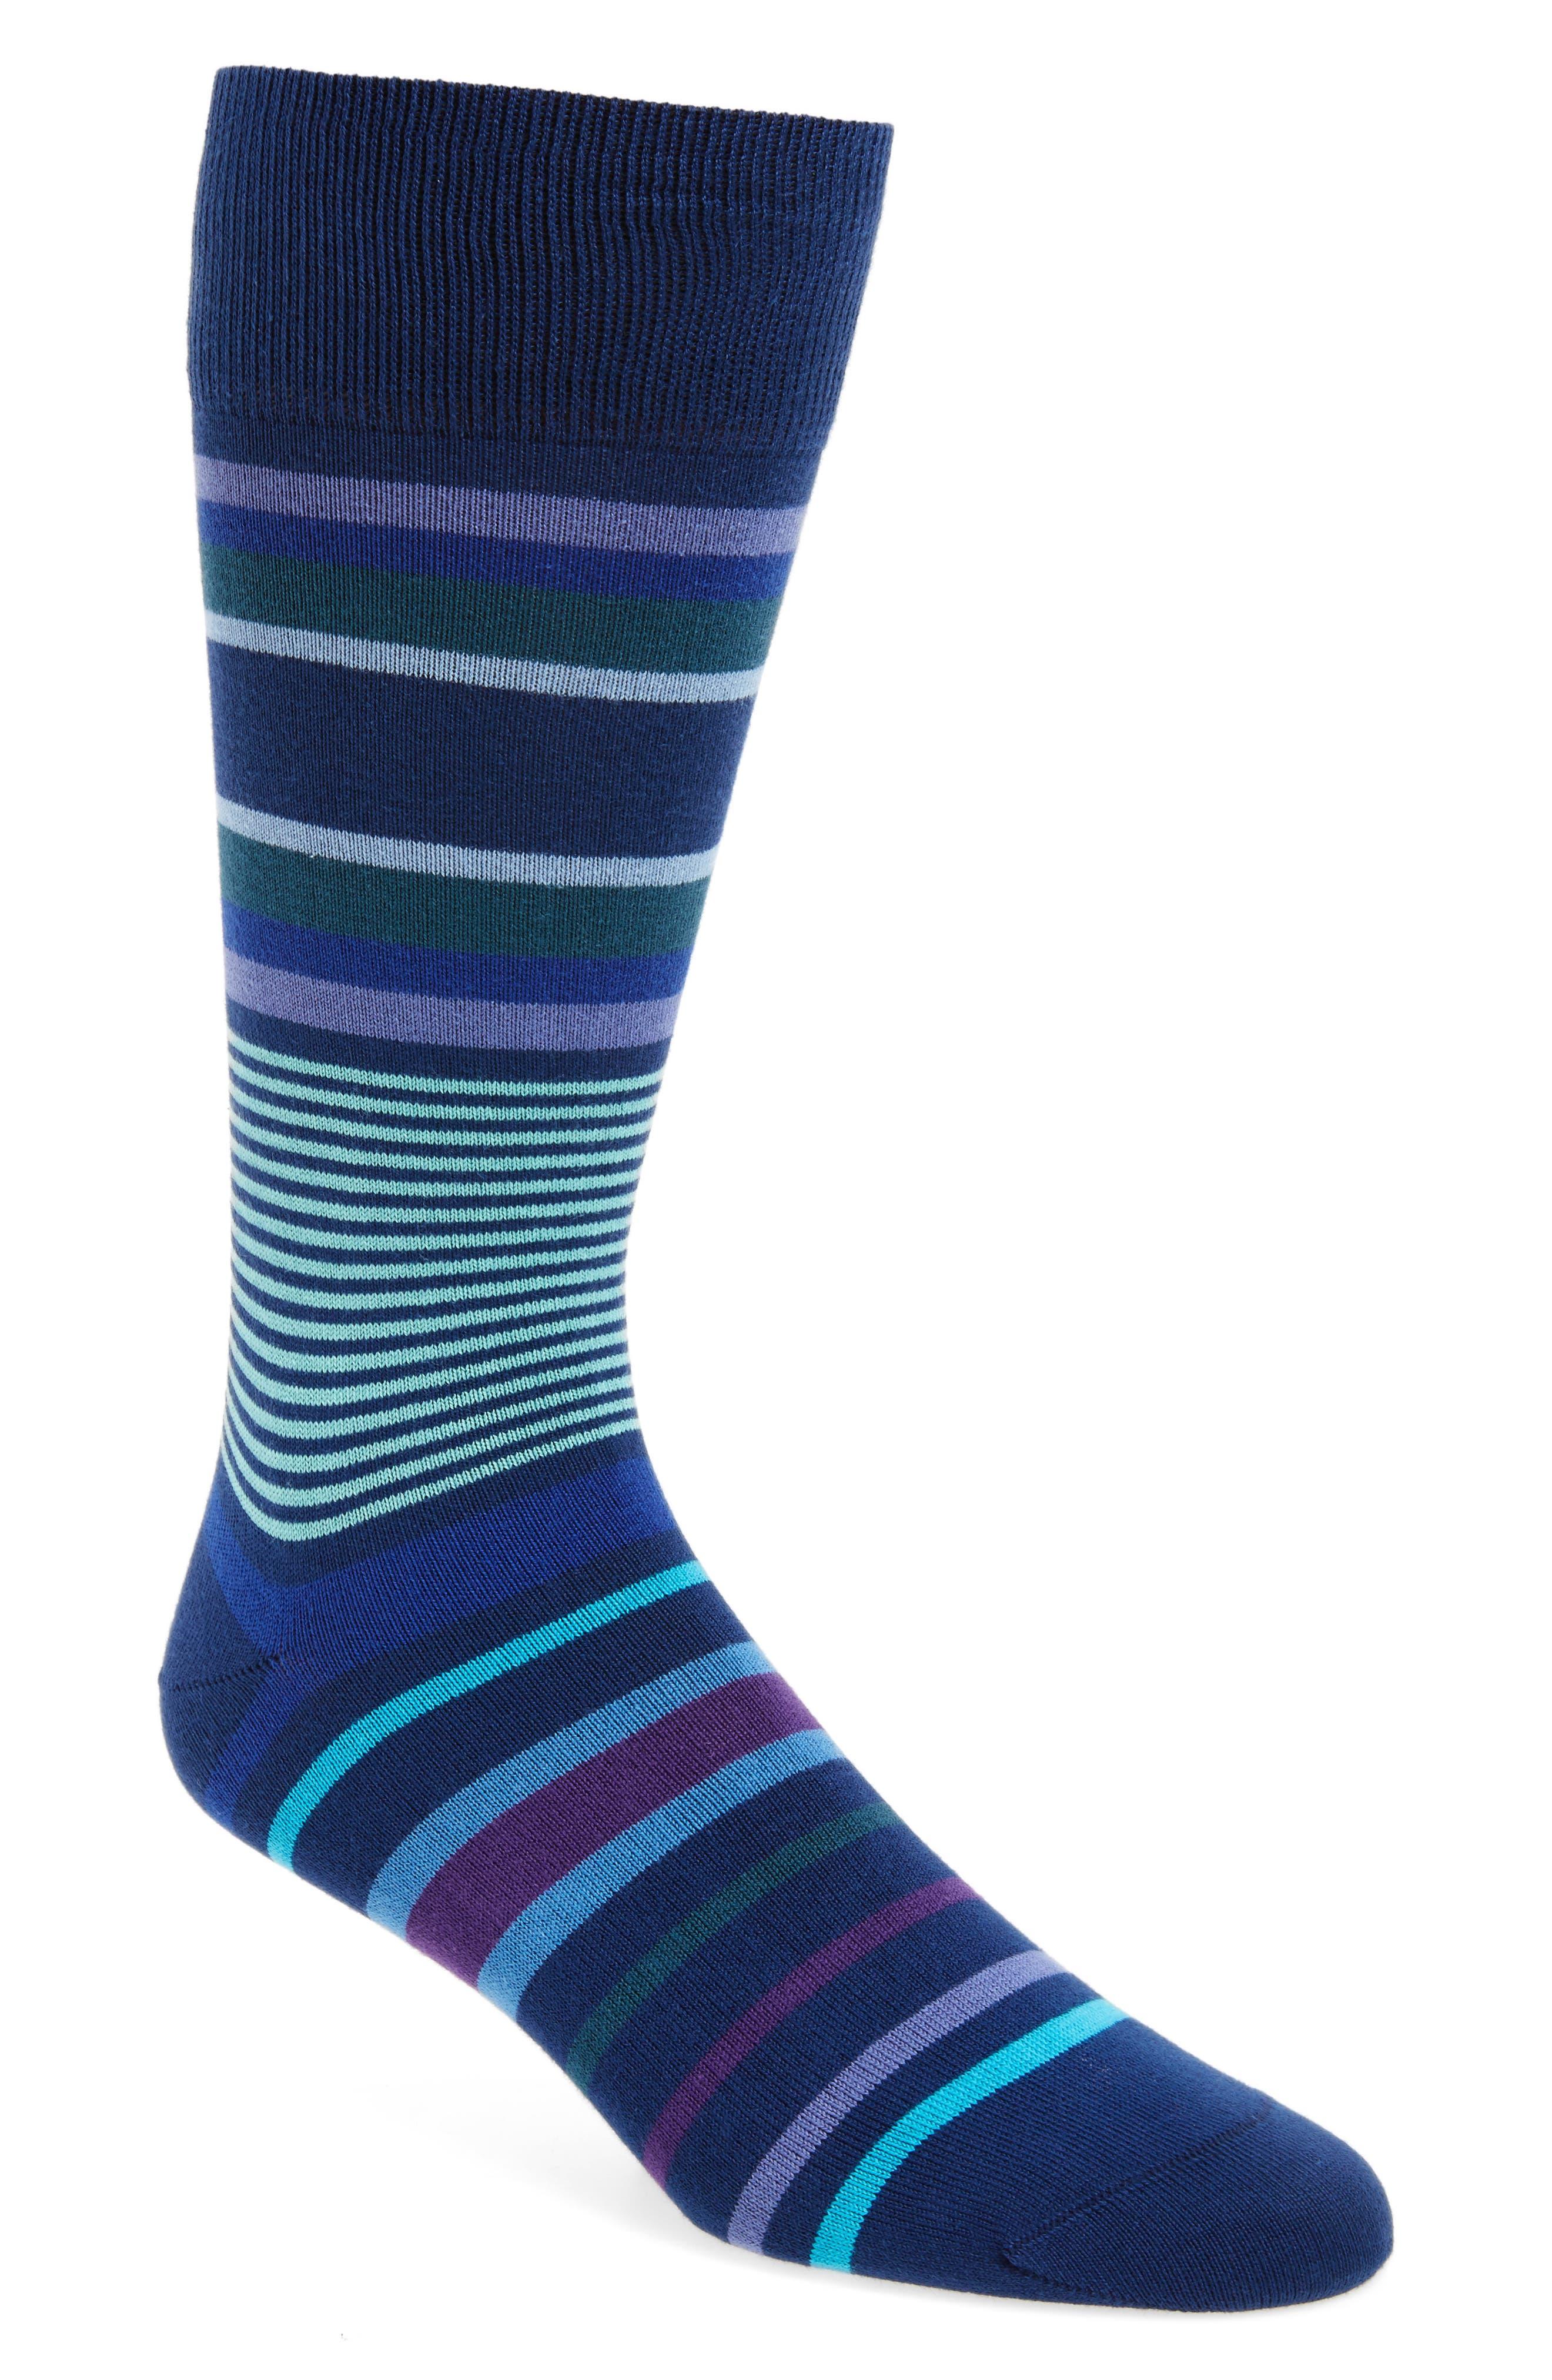 Alternate Image 1 Selected - Paul Smith Lawn Stripe Socks